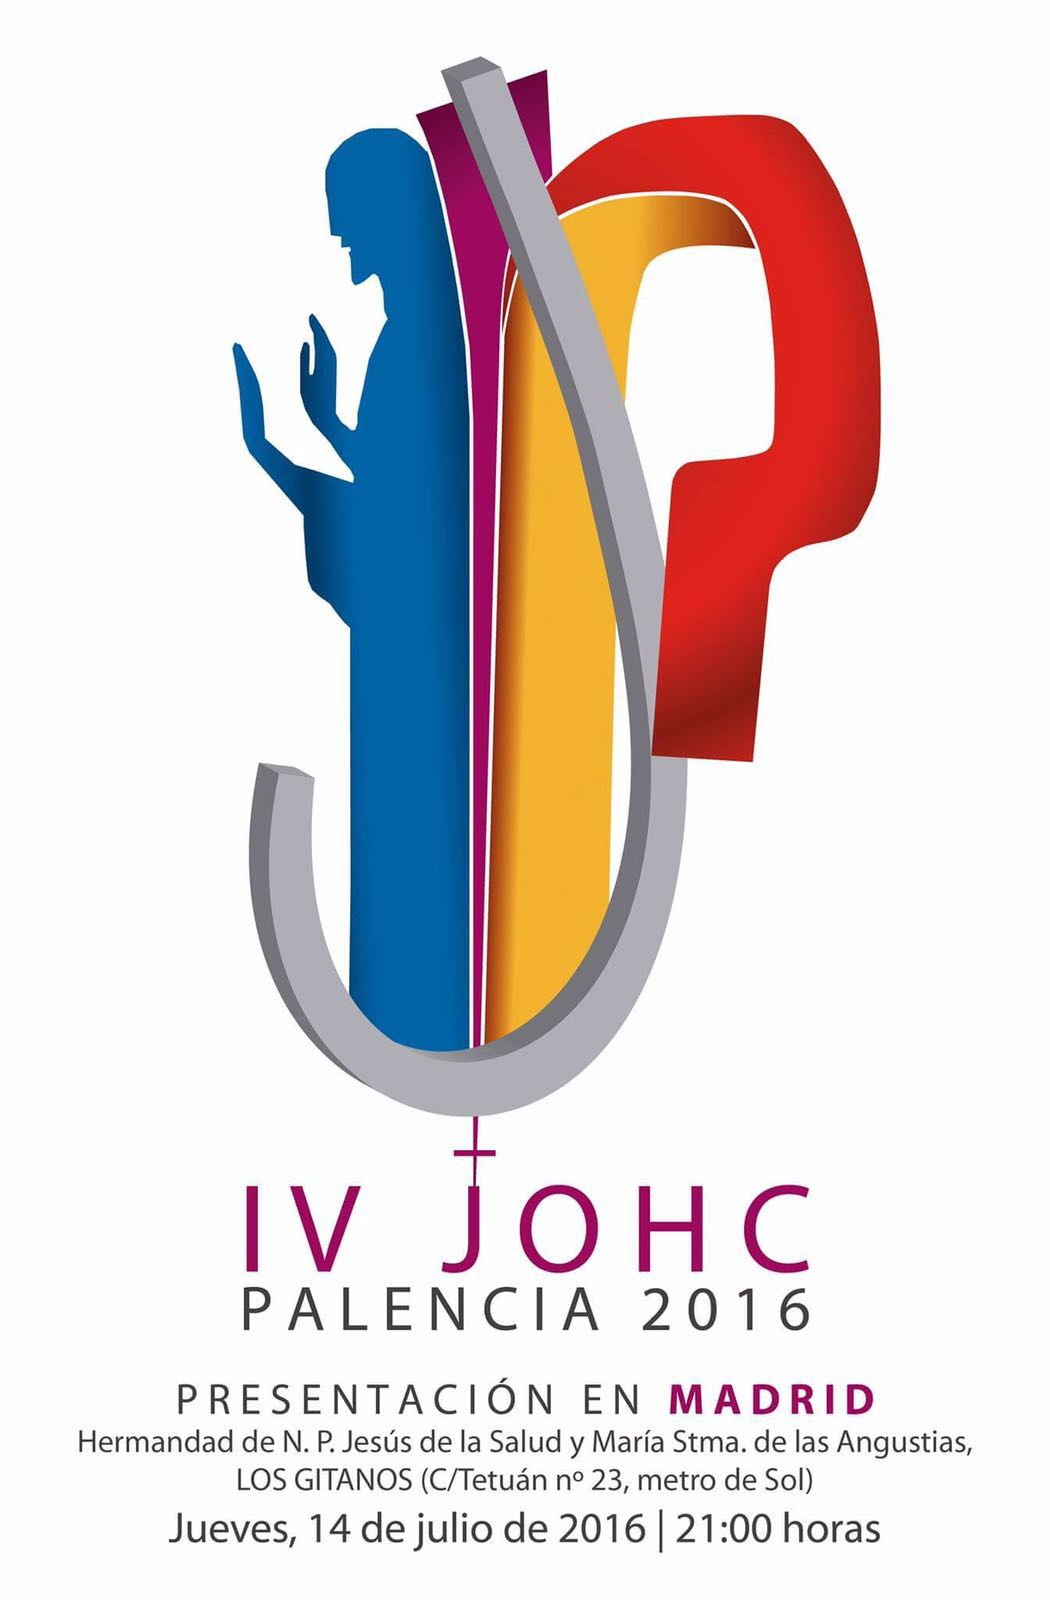 IV JOHC